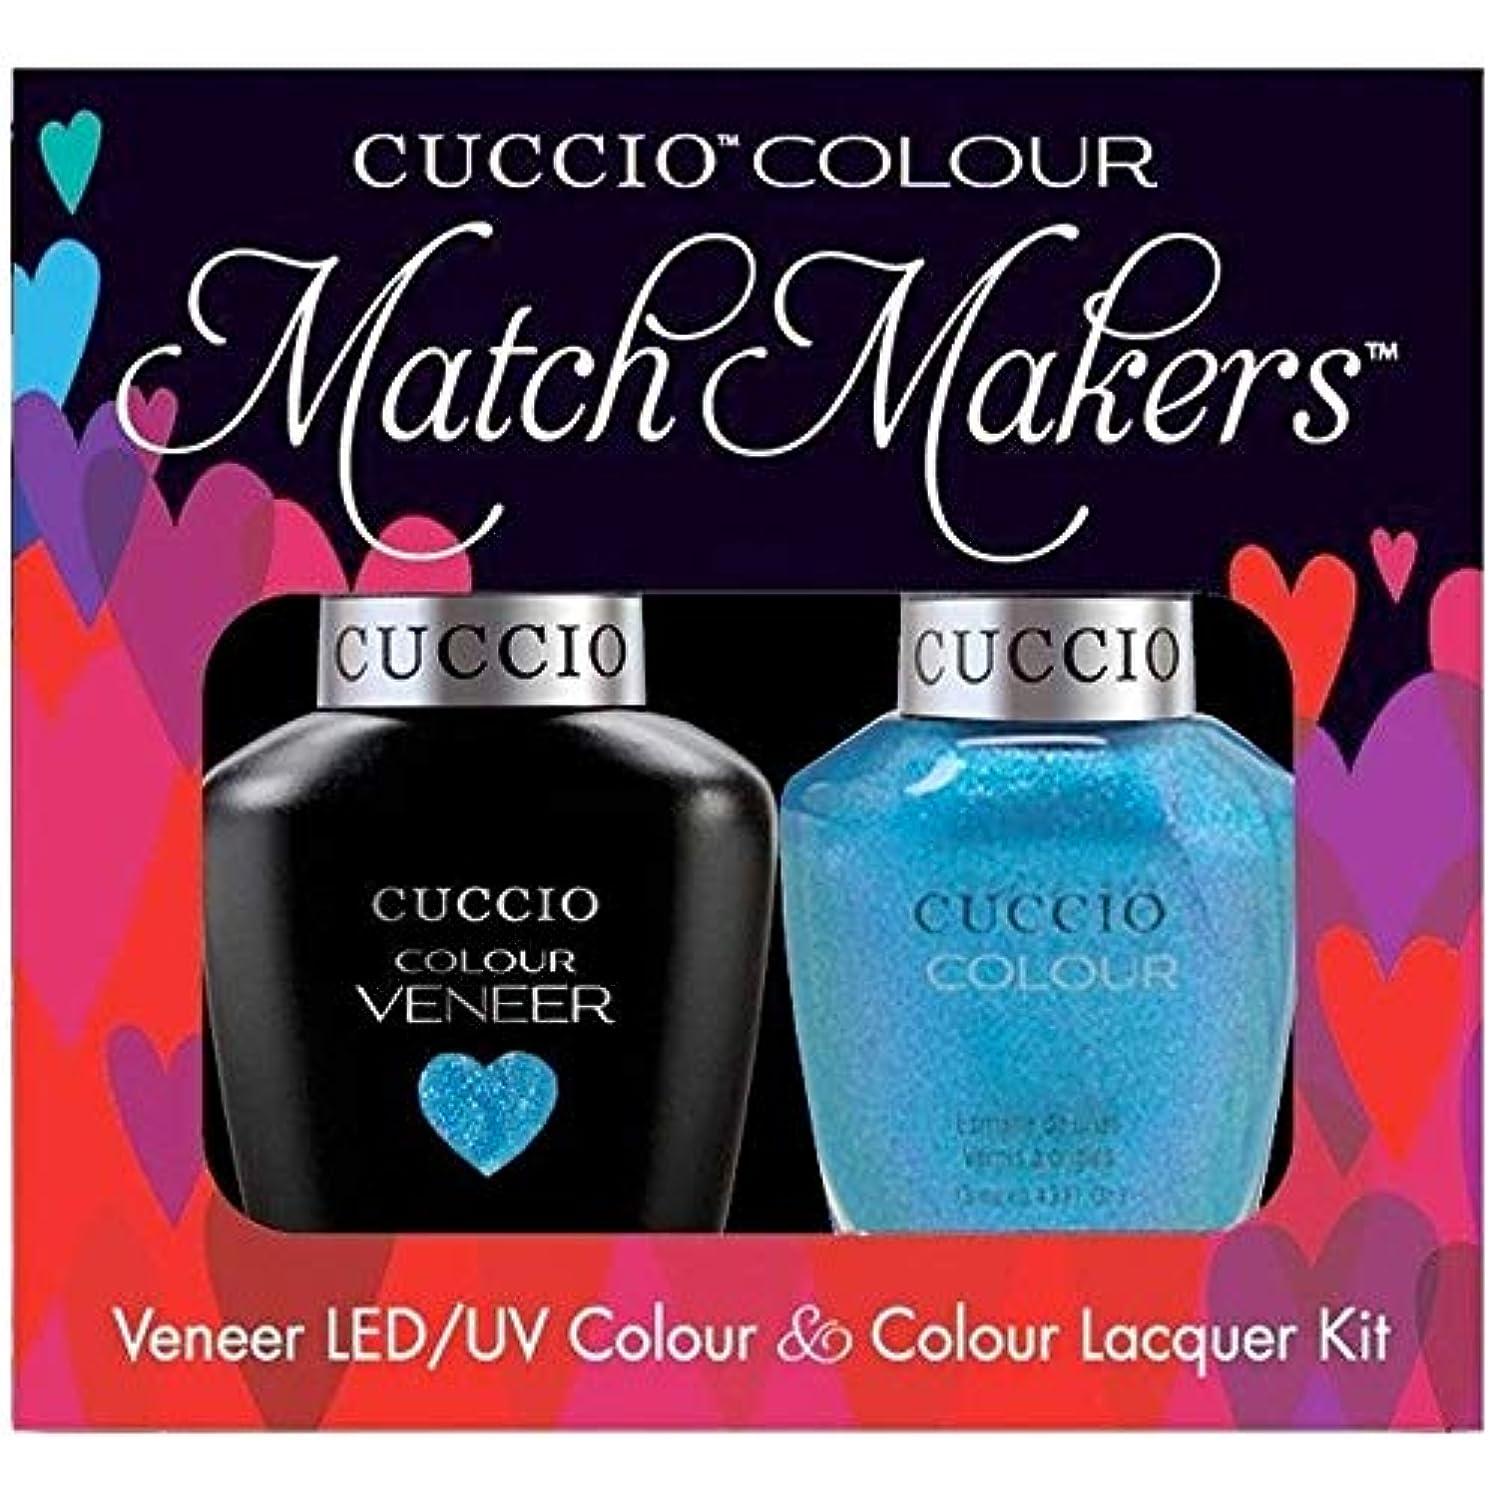 Cuccio MatchMakers Veneer & Lacquer - Roller Skate! - 0.43oz / 13ml Each